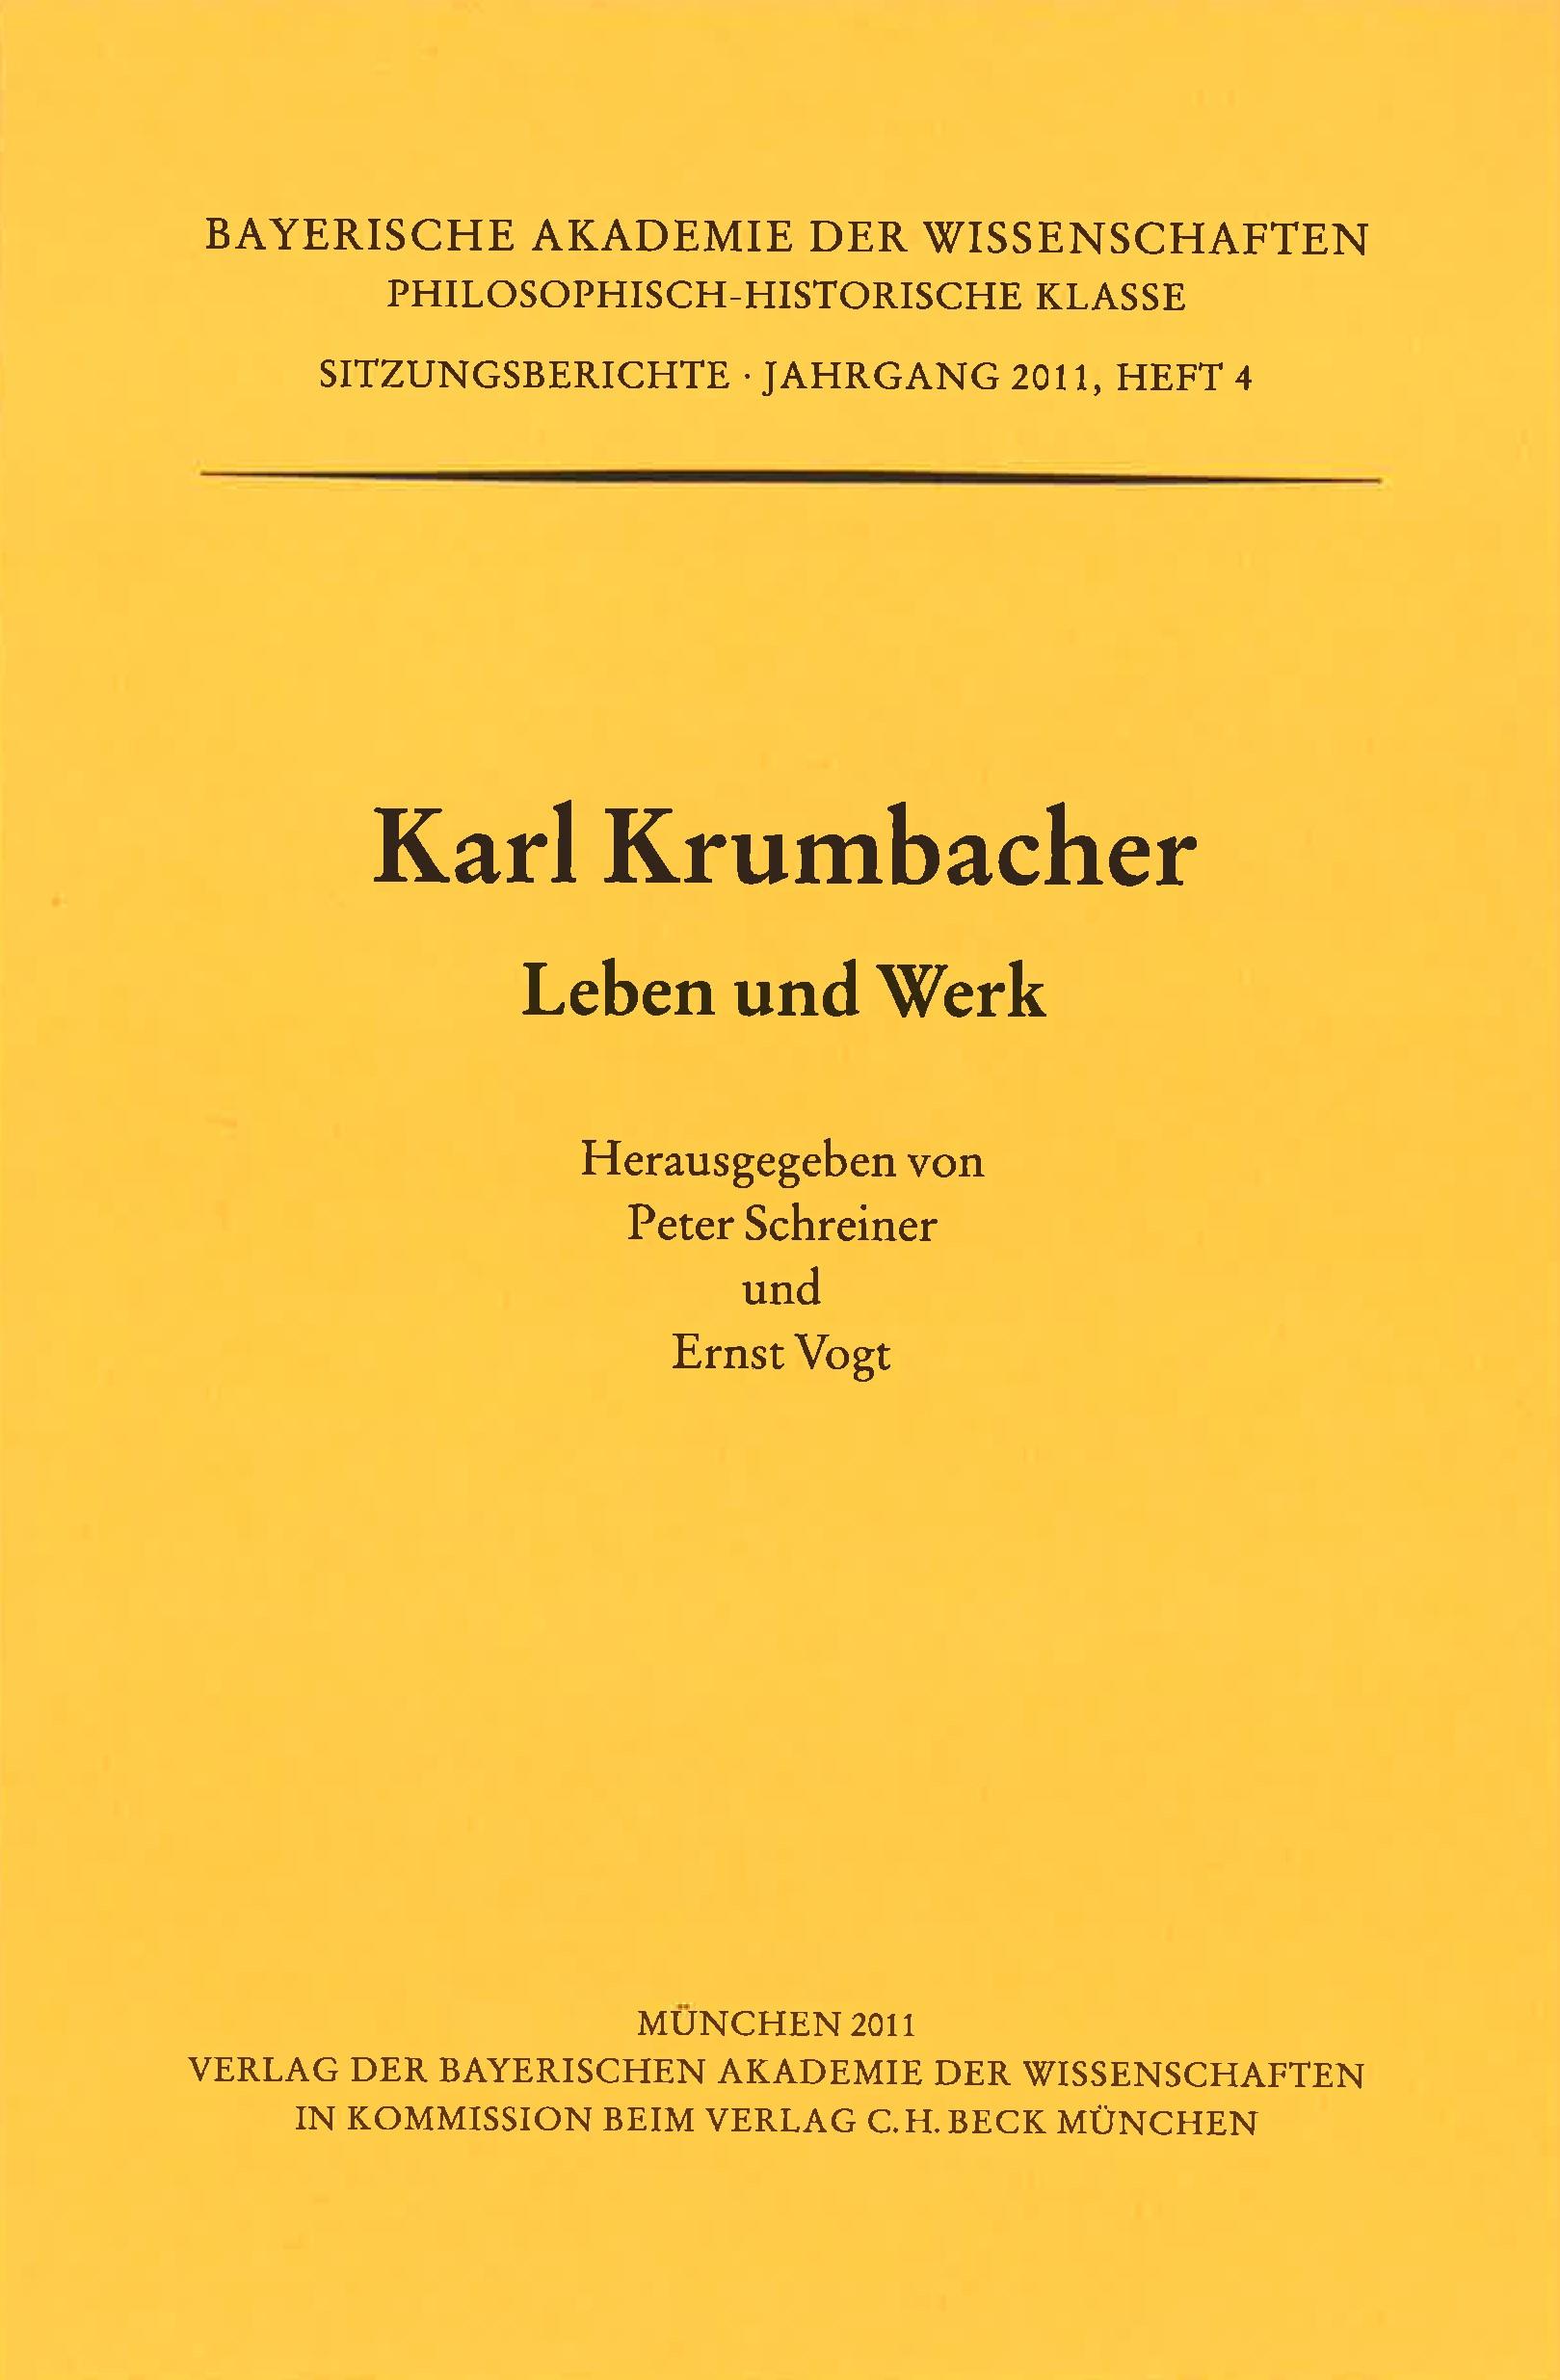 Cover des Buches 'Karl Krumbacher'